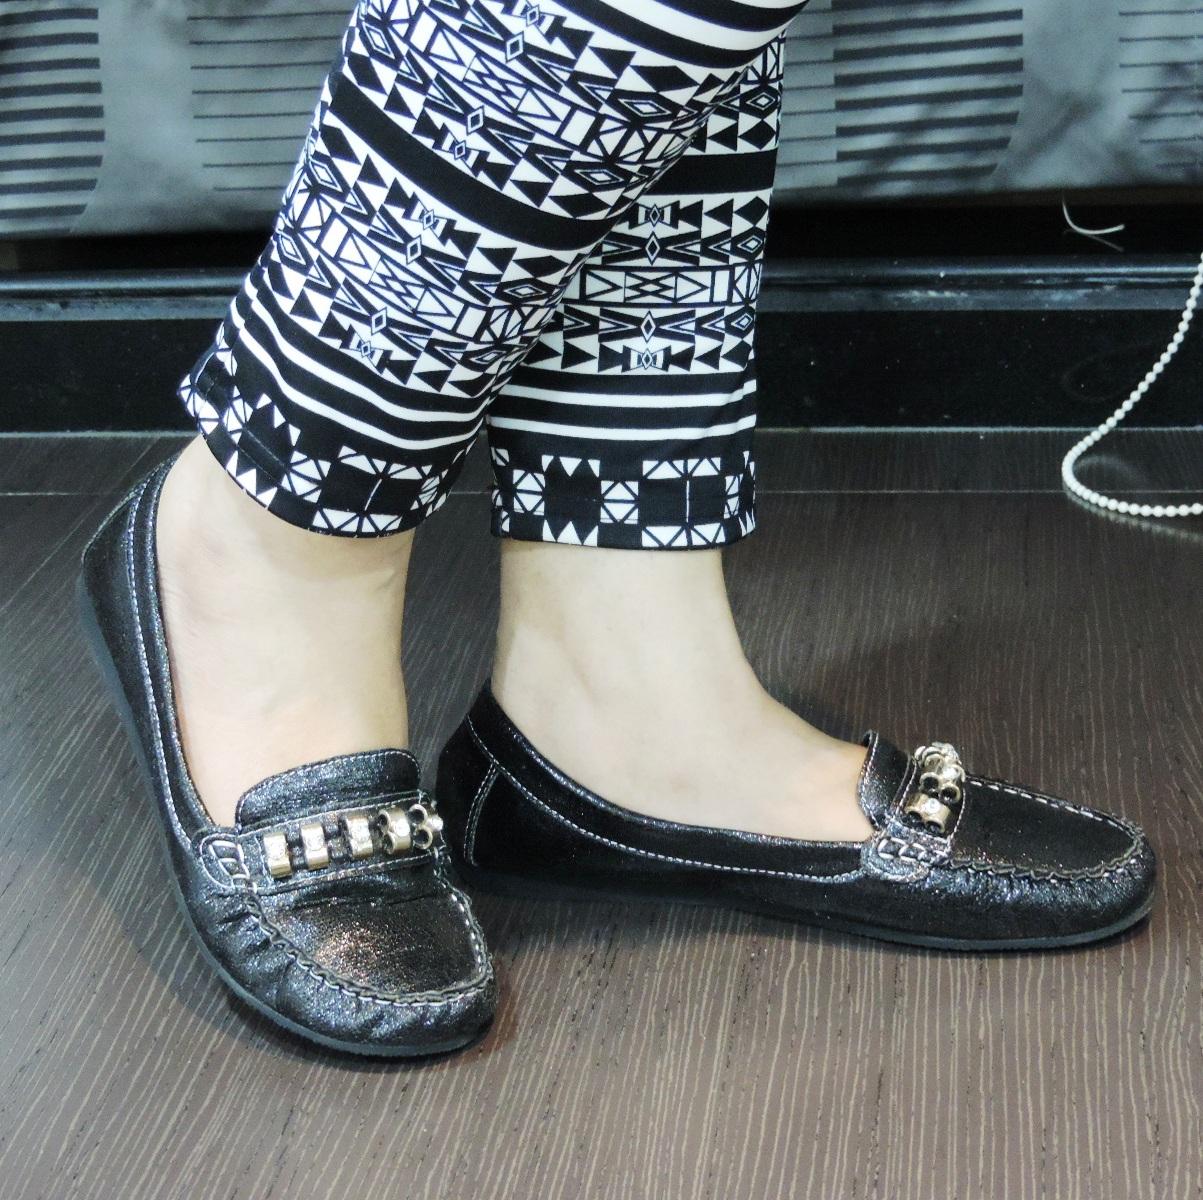 Pavers England Black shoe